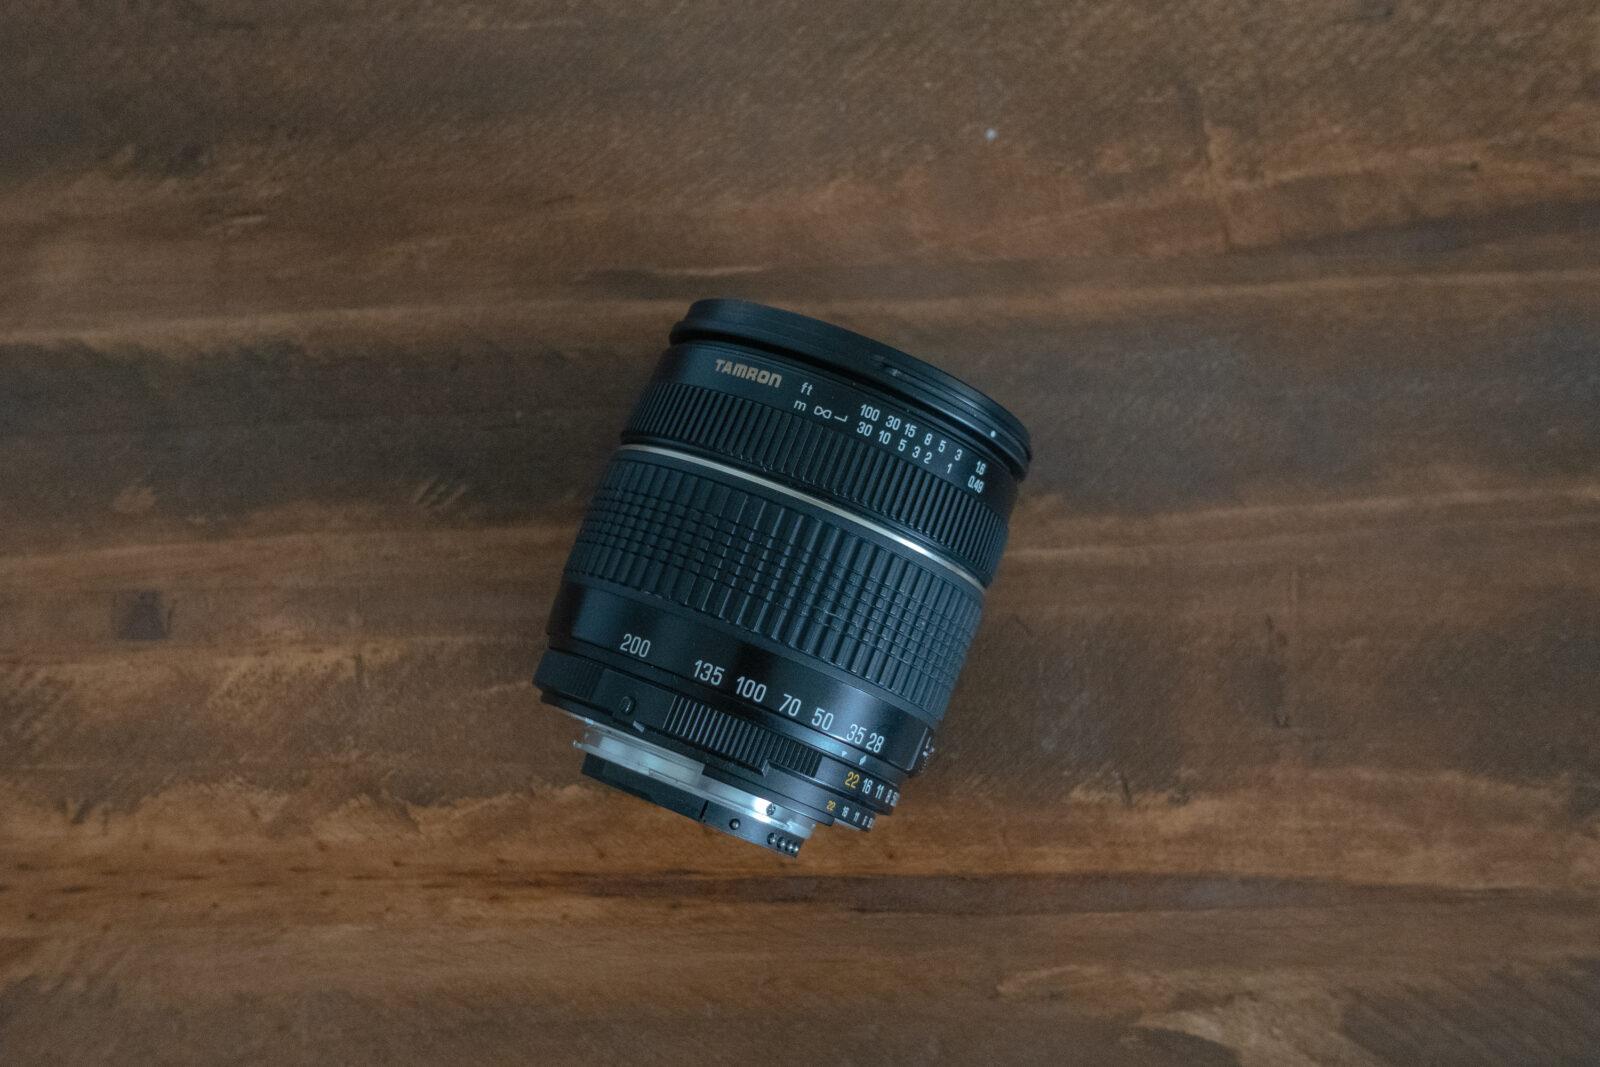 TAMRON 28-200mm F3.8-5.6 Macro